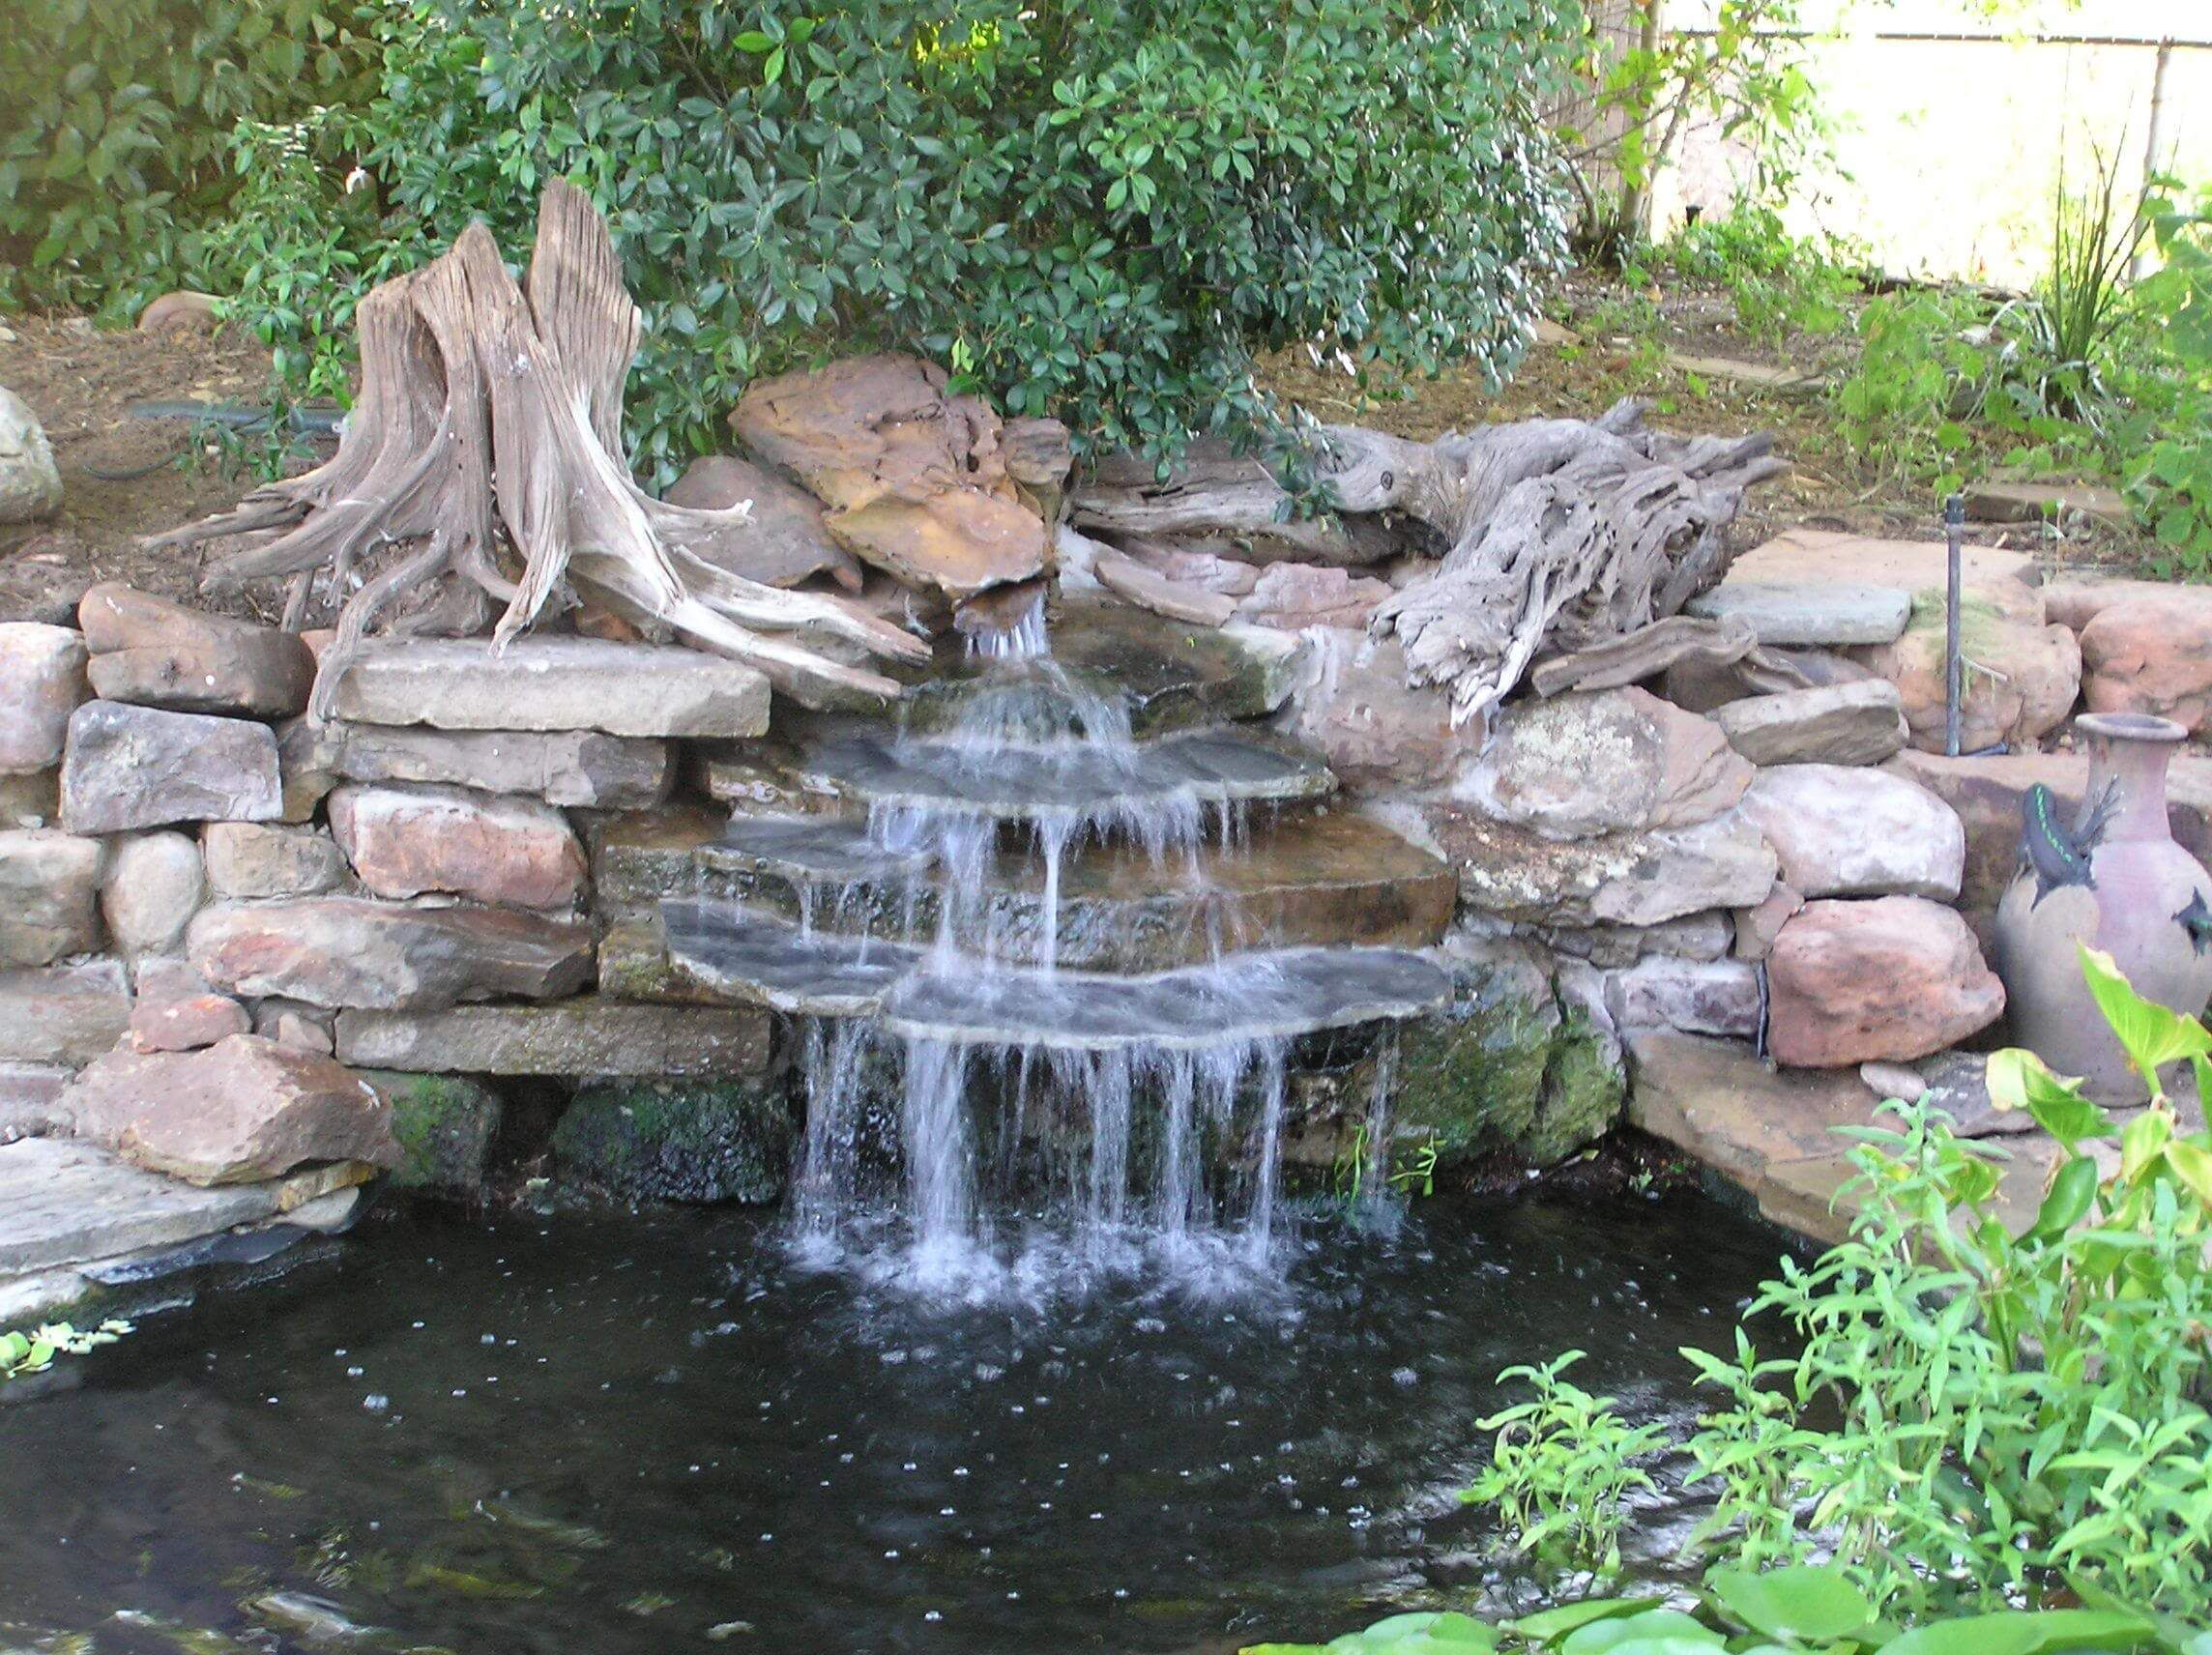 Best Waterfall Ideas for Backyard and Home Garden | Сад | Pinterest ...